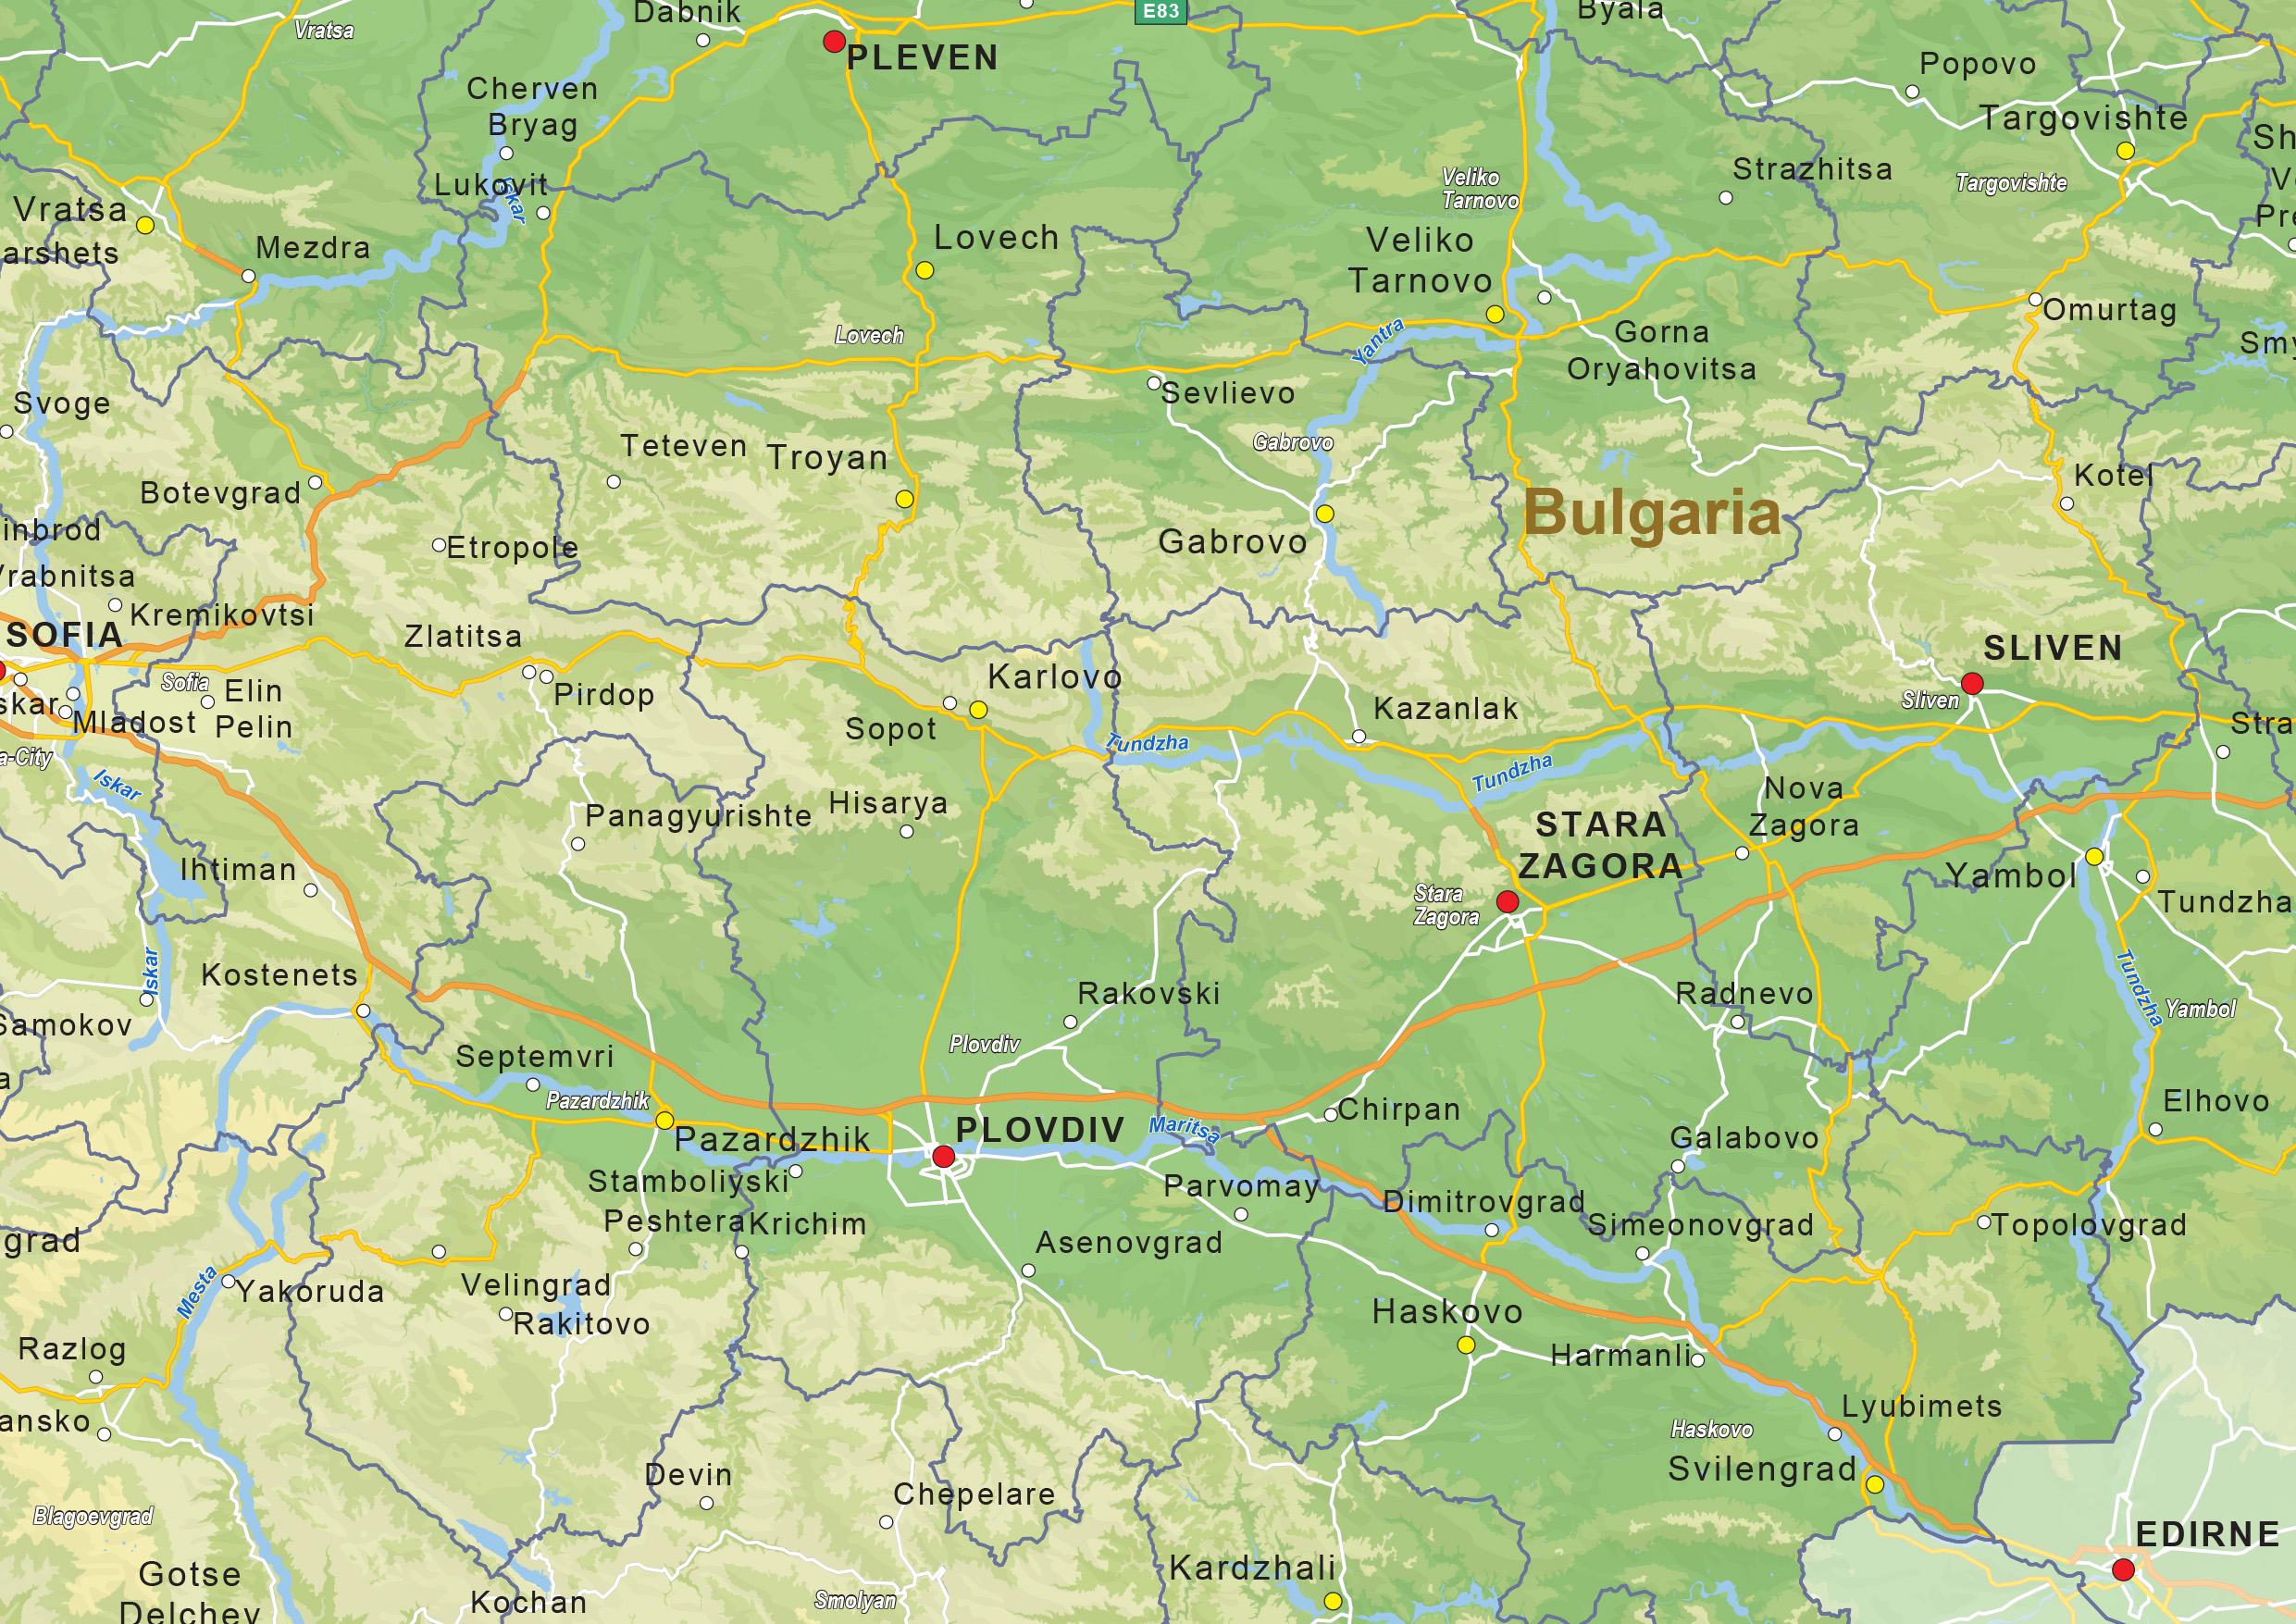 Digital physical map of Bulgaria 1427 The World of Mapscom